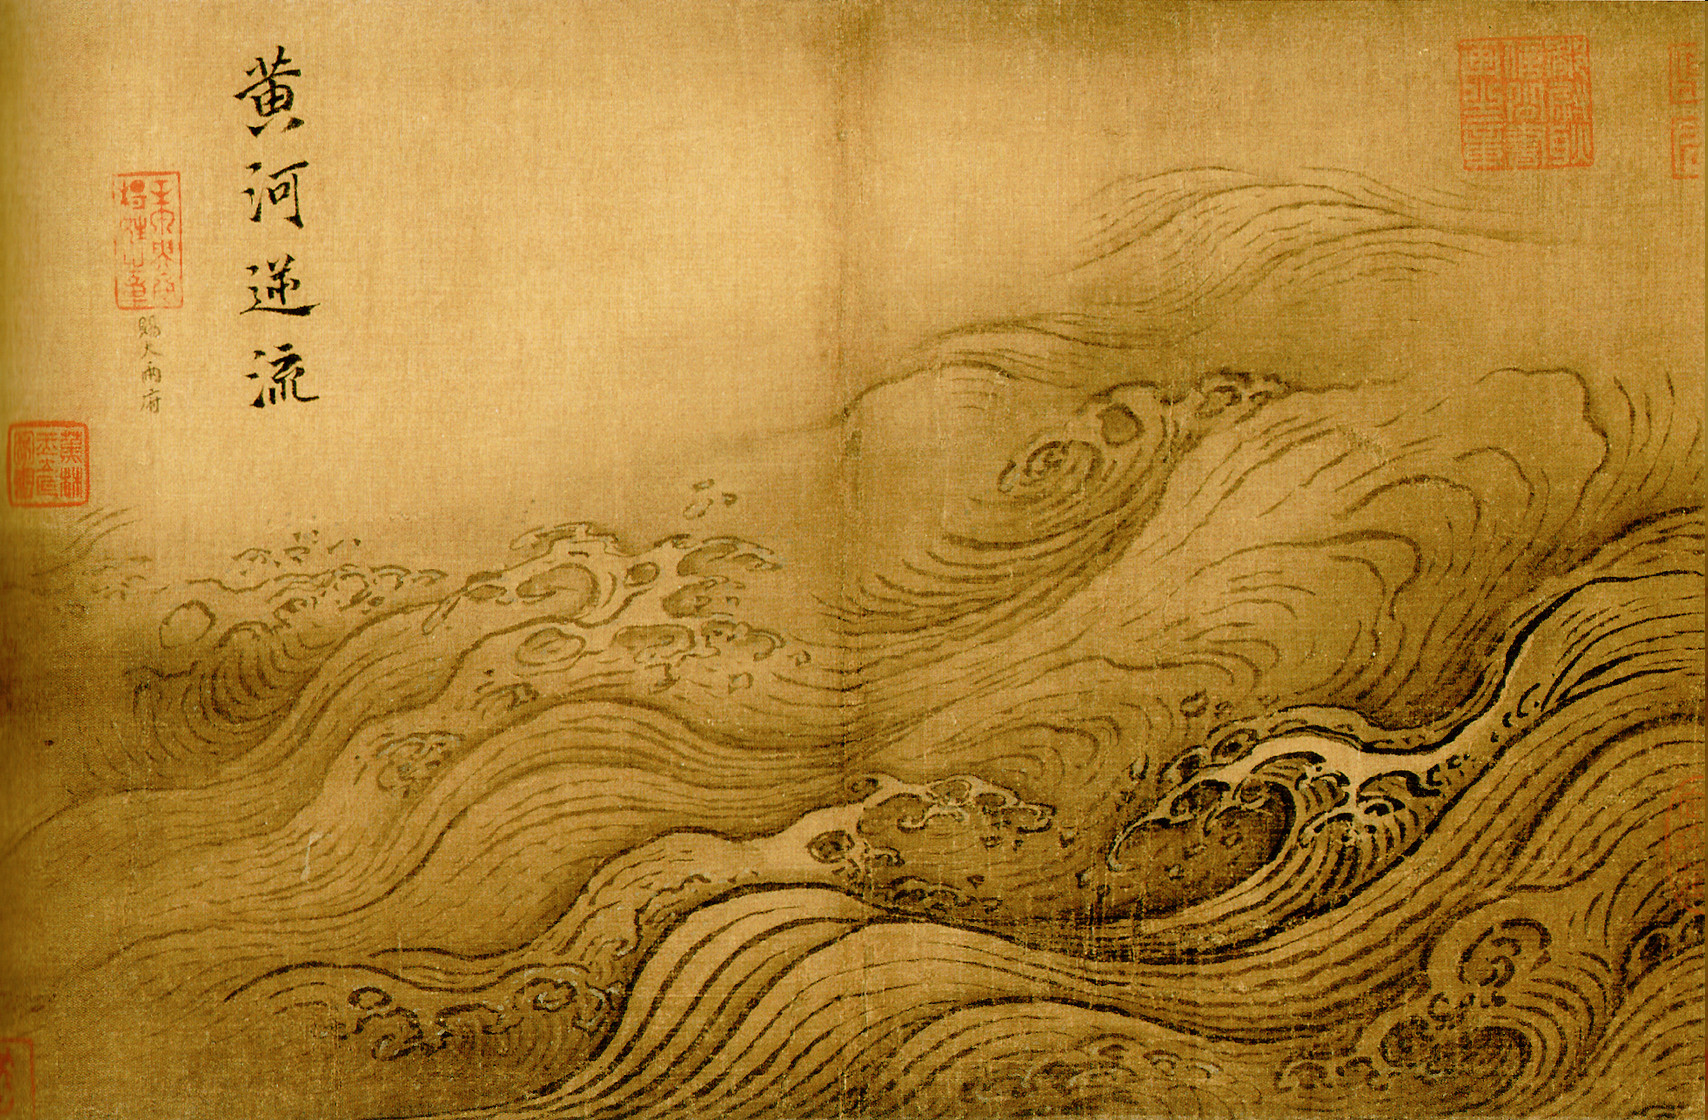 ma_yuan_water_album_the_yellow_river_breaches_its_course-wikimedia.jpg